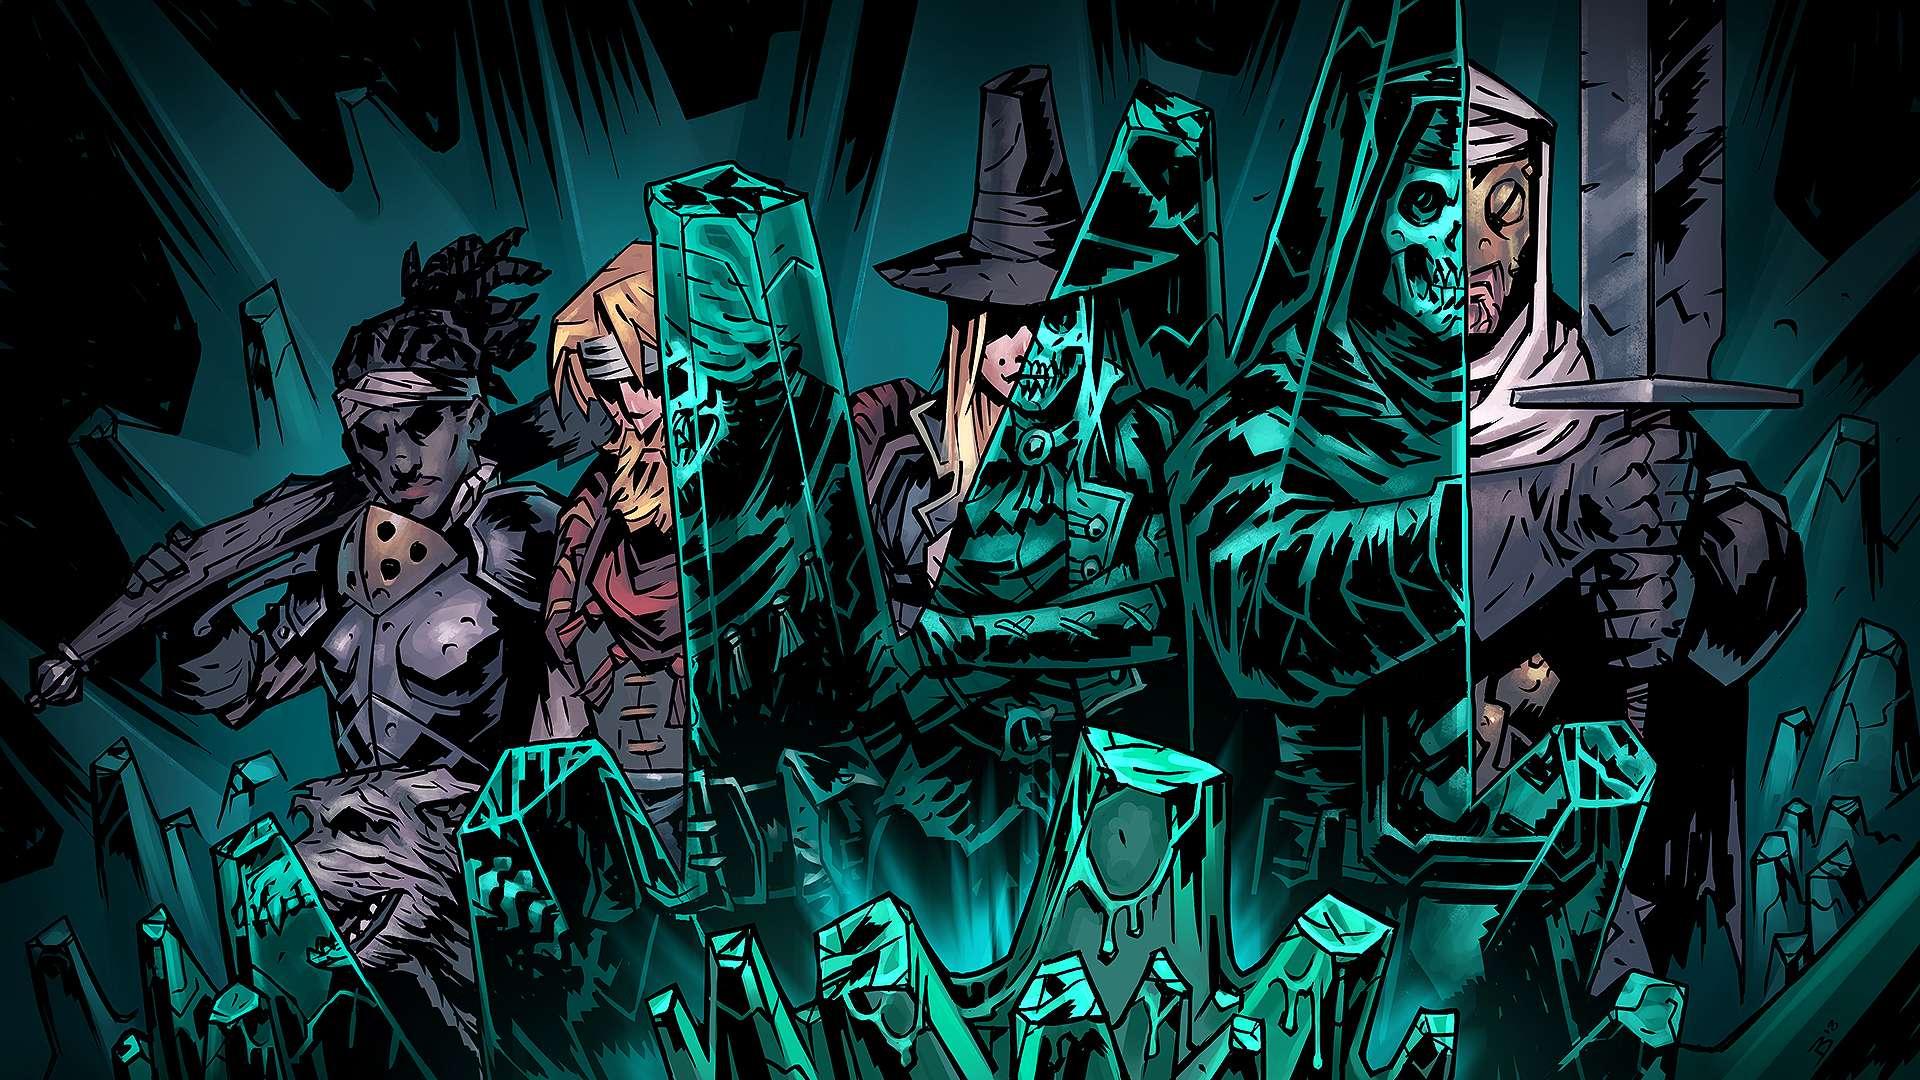 Картинки по запросу darkest dungeon